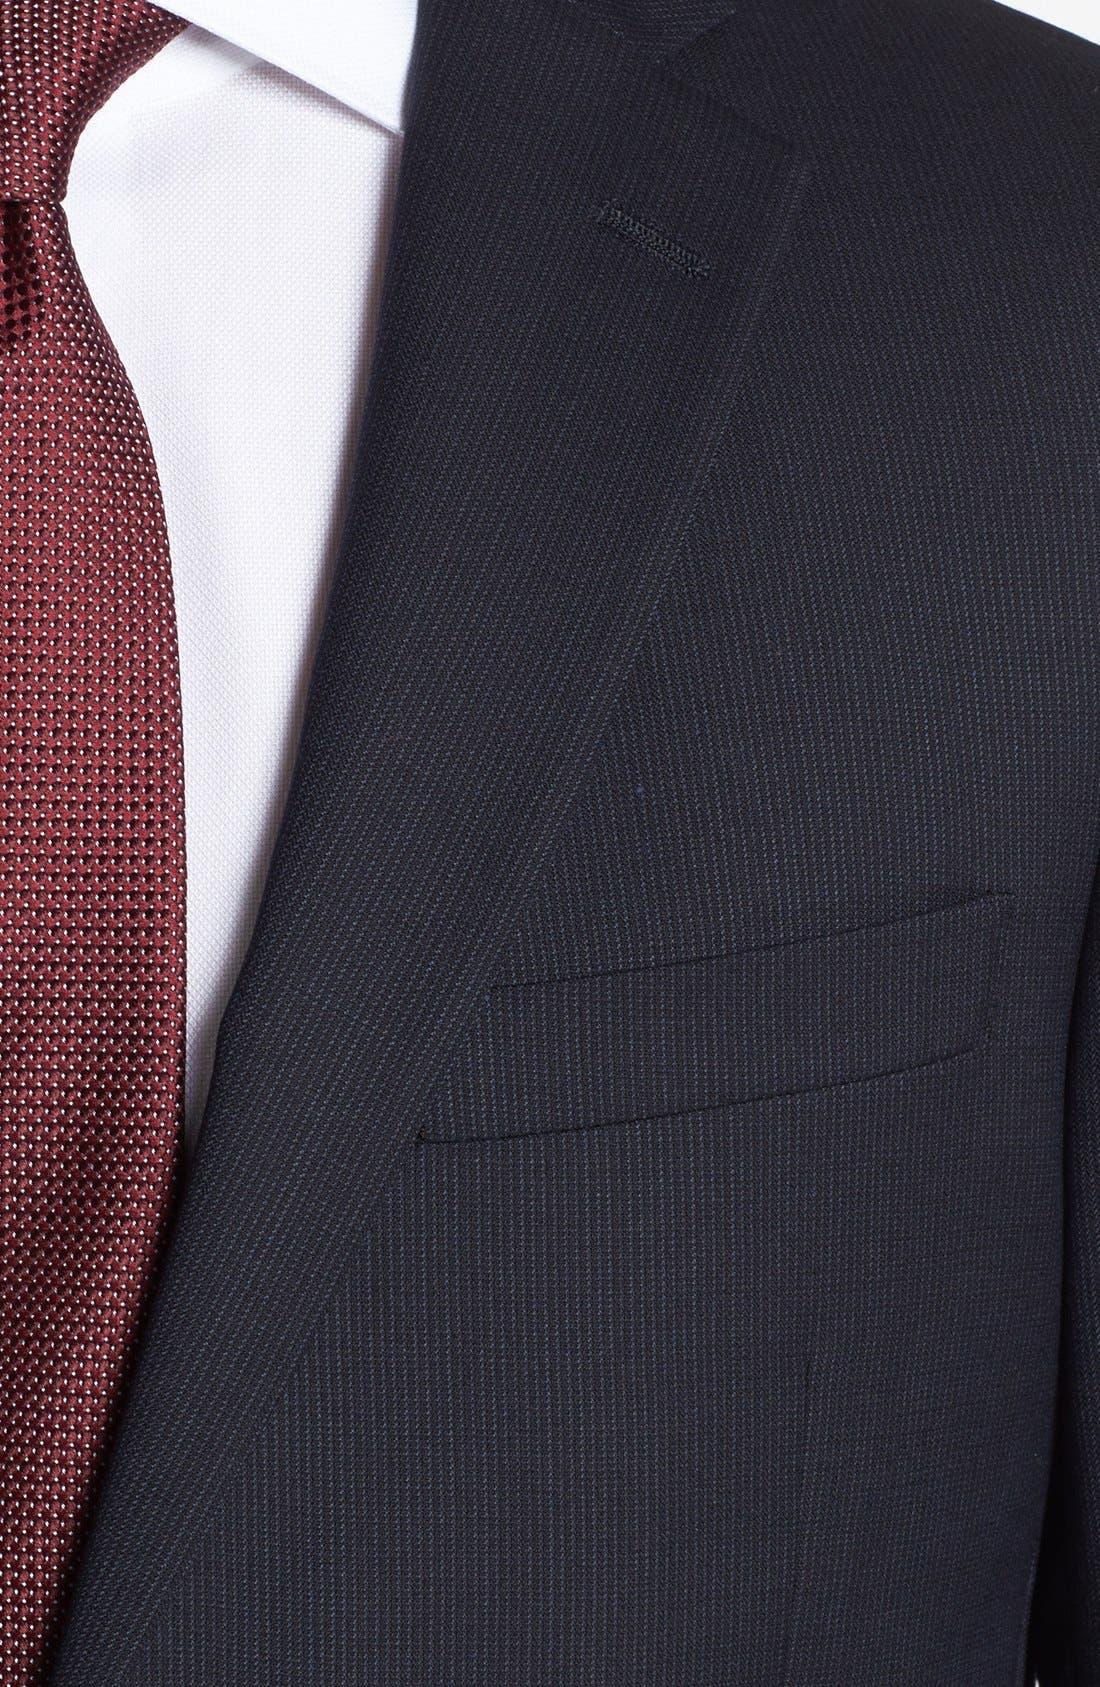 Alternate Image 2  - Hart Schaffner Marx 'New York' Classic Fit Stripe Suit